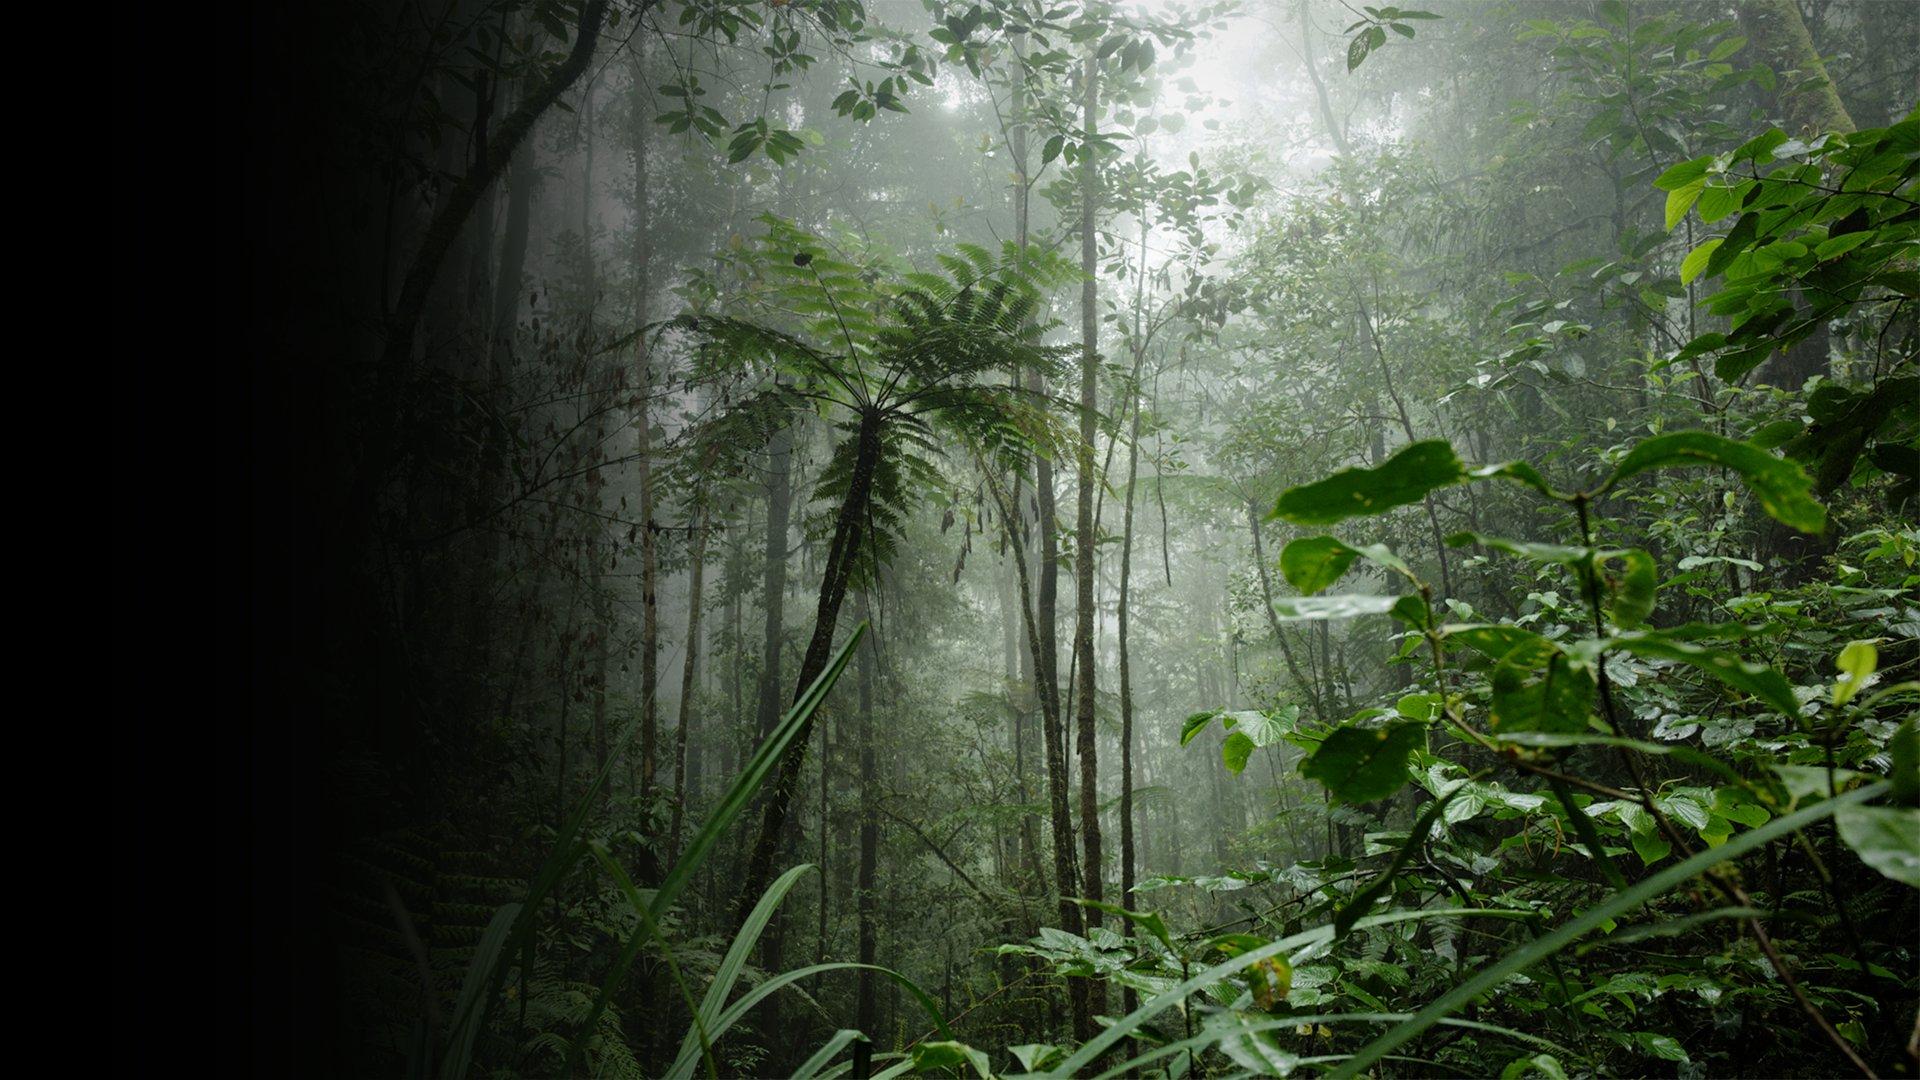 fond Seb en Papouasie : la vraie aventure